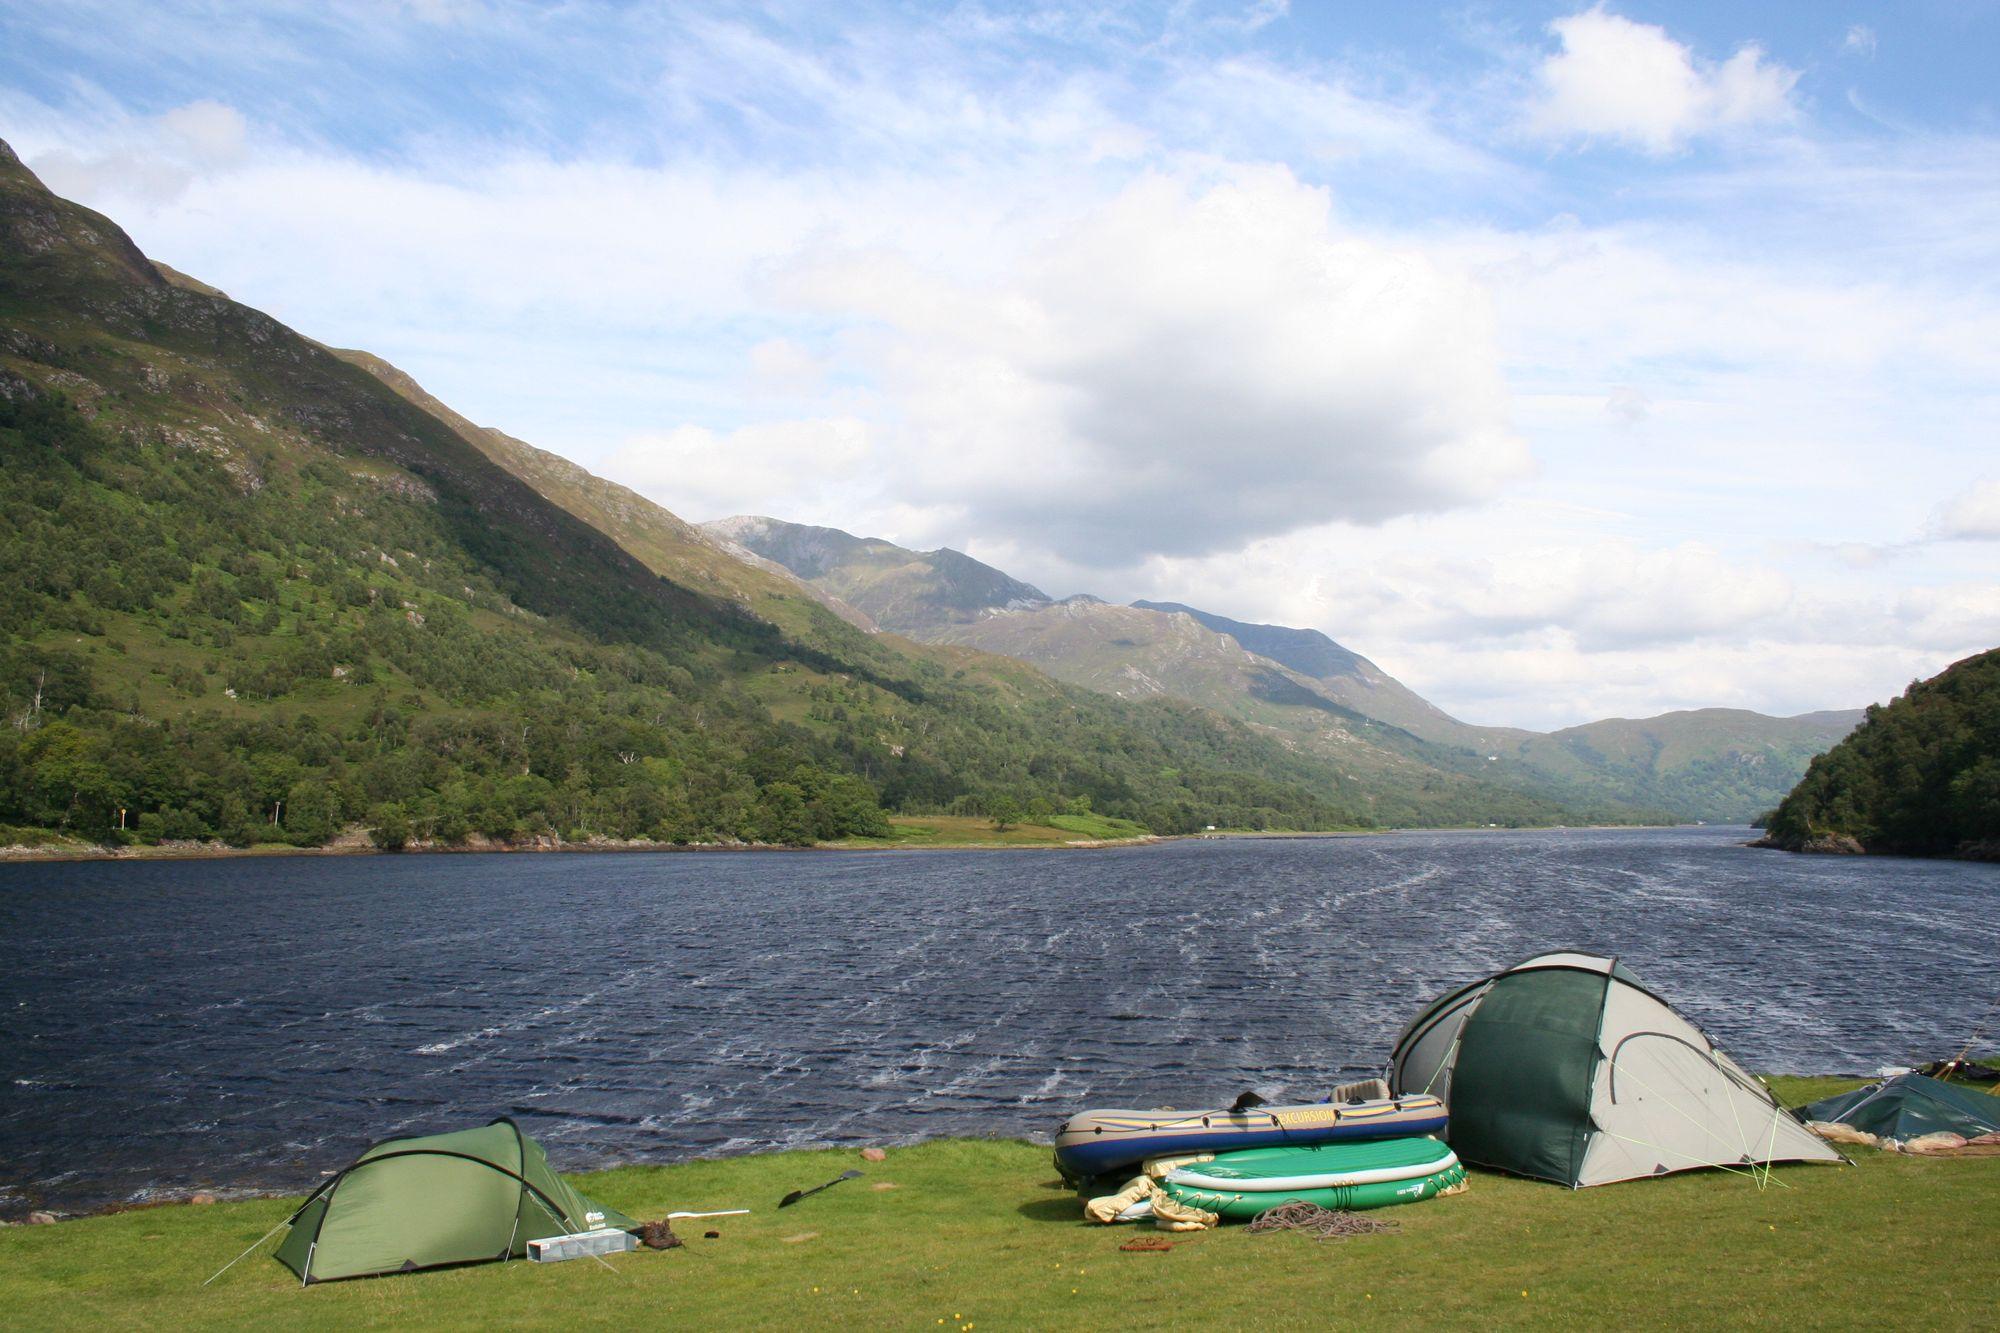 Caolasnacon Caravan and Camping Park